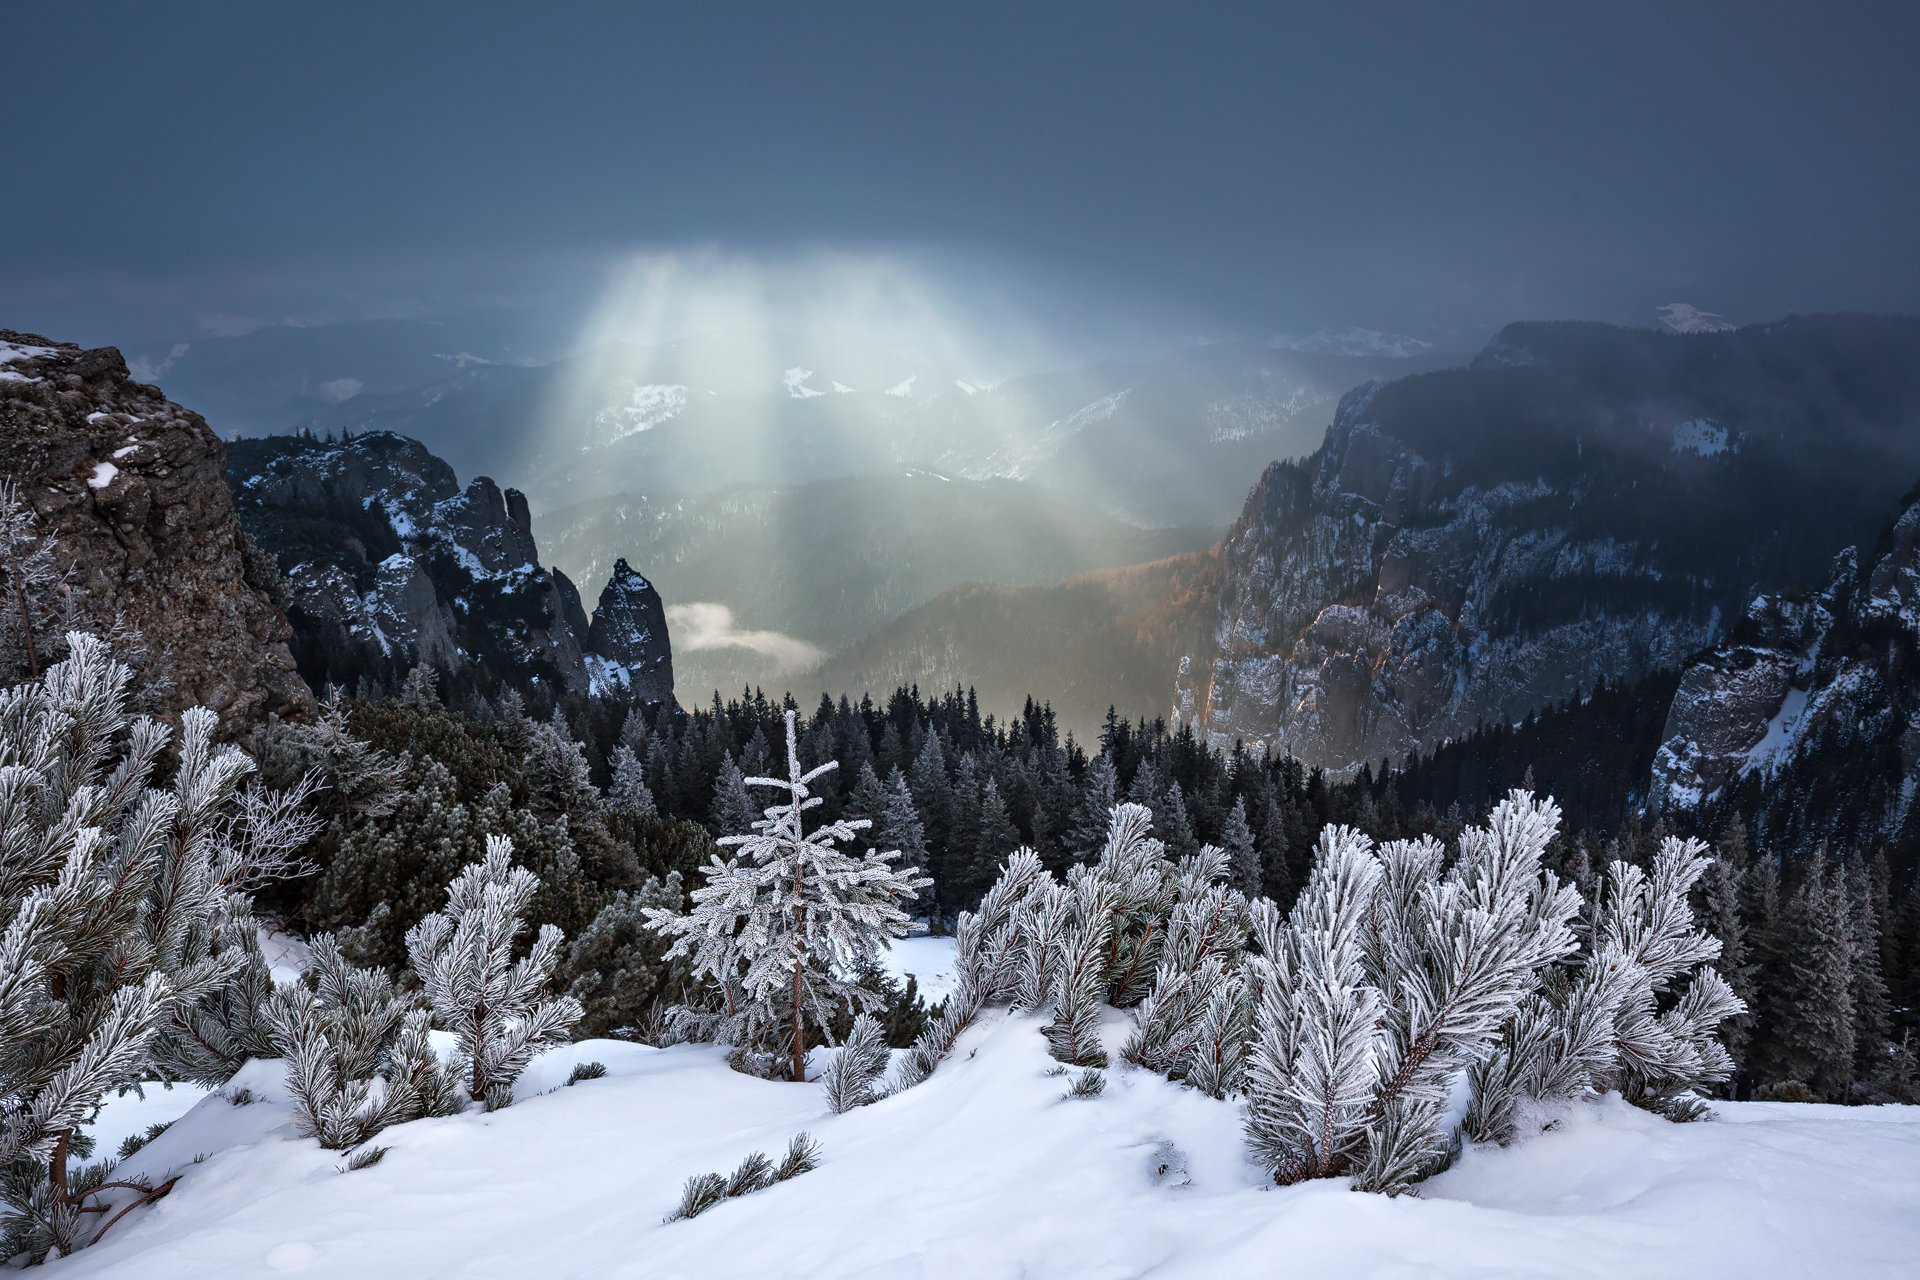 winter, trees, storm, snow, landscape, travel, nature, mountain, romania, cold, sunrise, light, Lazar Ioan Ovidiu